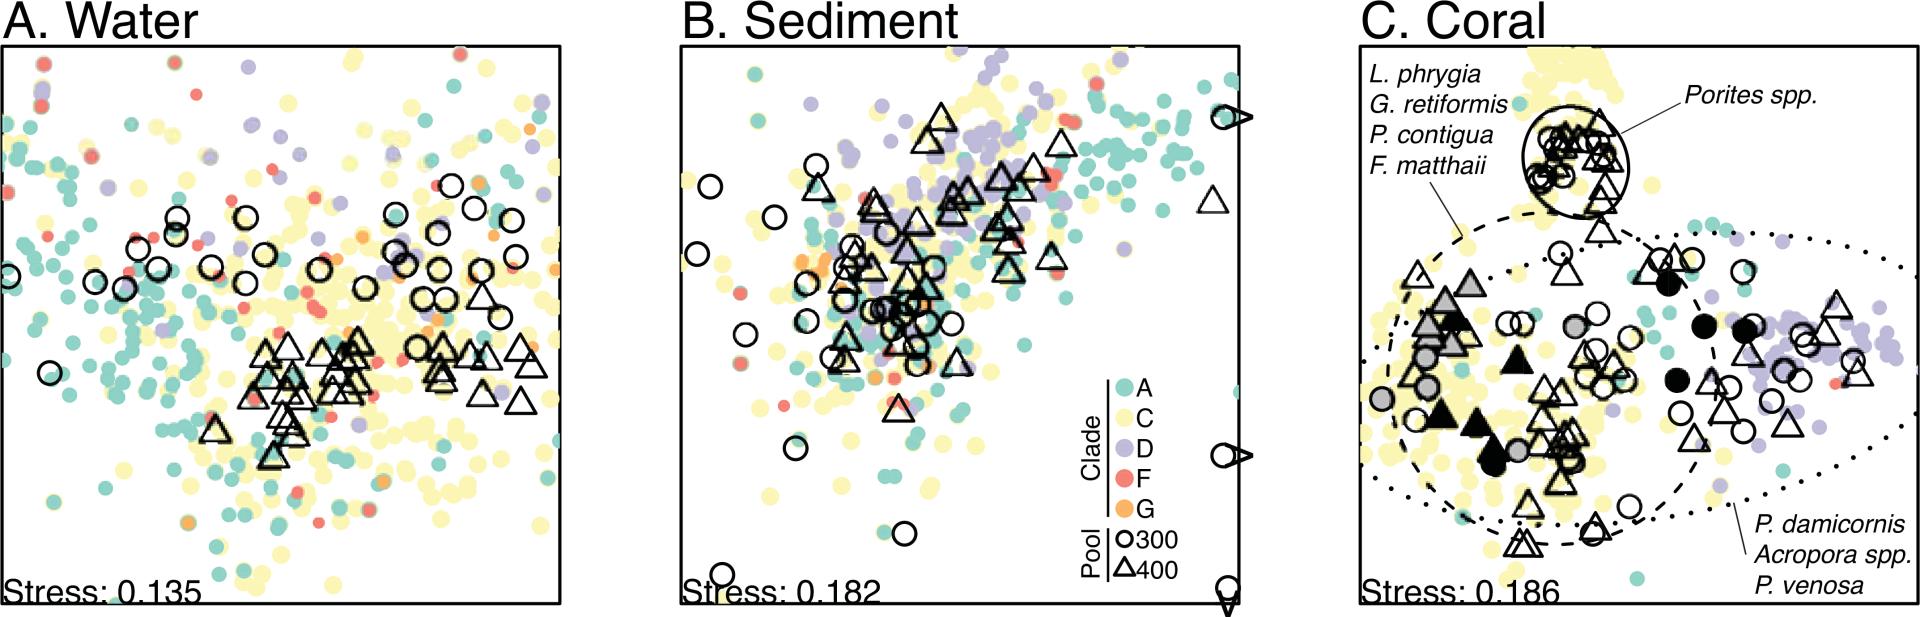 New paper on Symbiodinium metacommunities in American Samoa